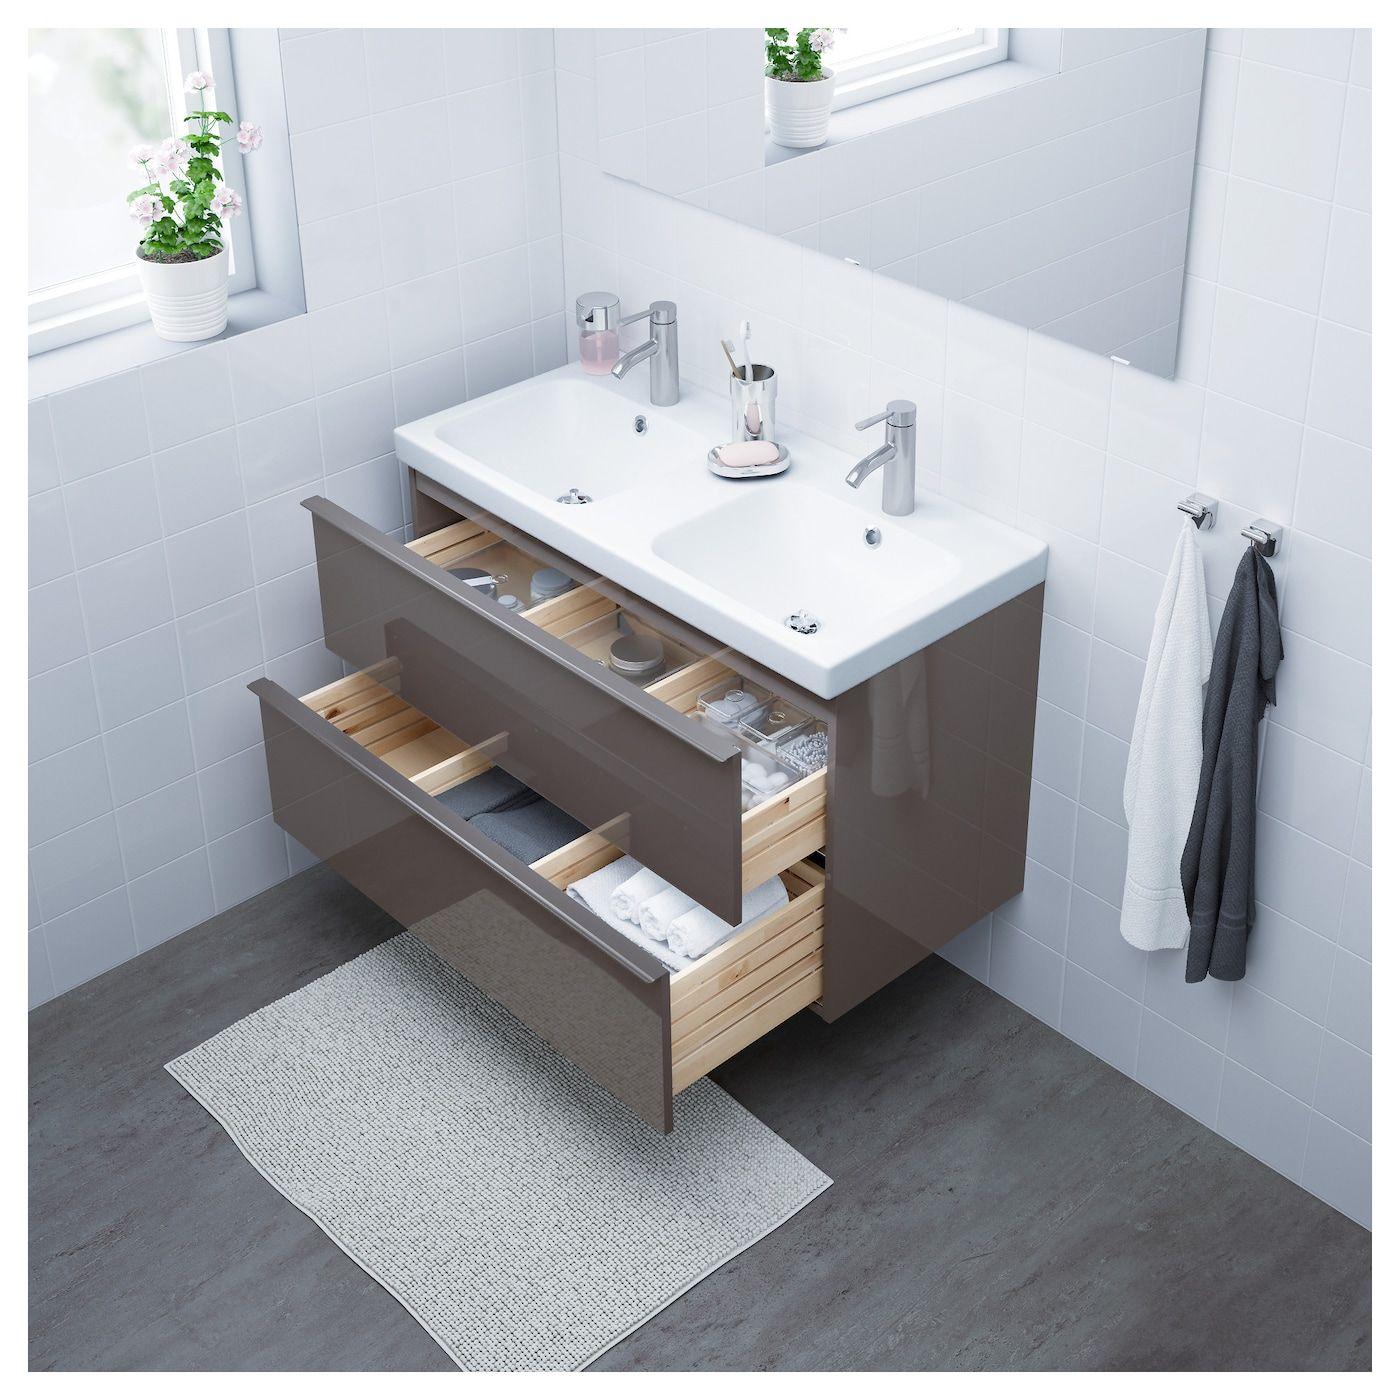 Godmorgon Odensvik Bathroom Vanity High Gloss Gray Dalskar Faucet 103x49x64 Cm Shop Ikea Ikea Ikea Godmorgon Bathroom Sink Cabinets Sink Cabinet